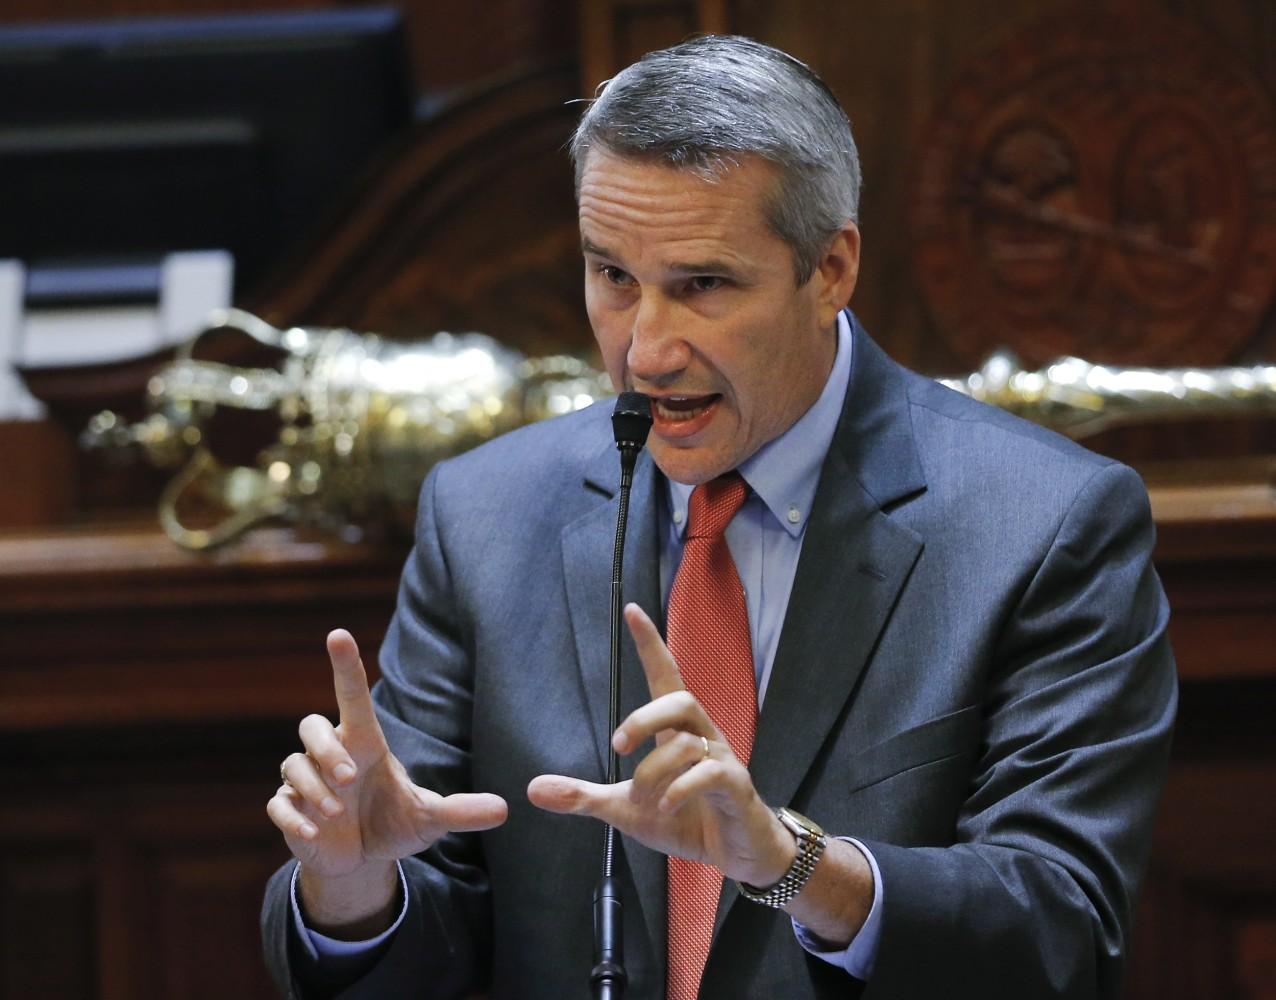 South Carolina Special Election Brings GOP Runoff for Congress